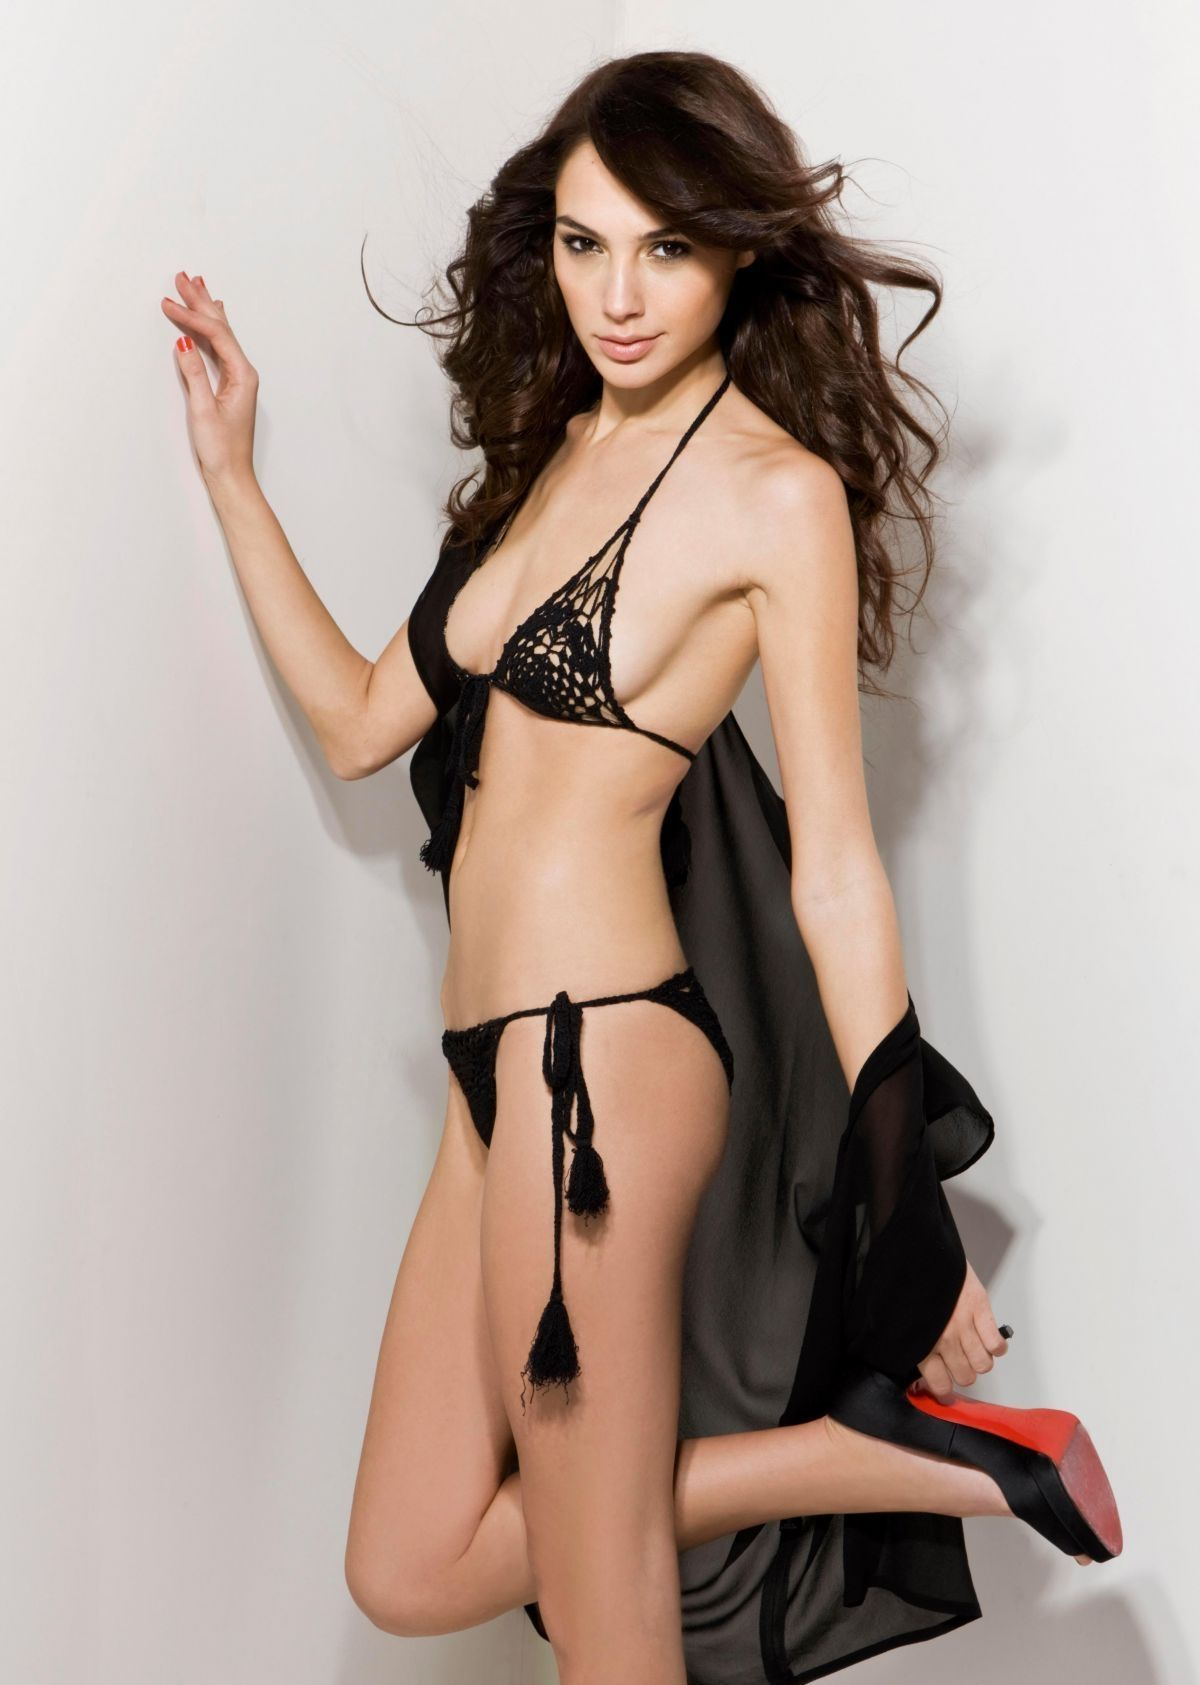 Leaked Erotica Gal Gadot naked photo 2017